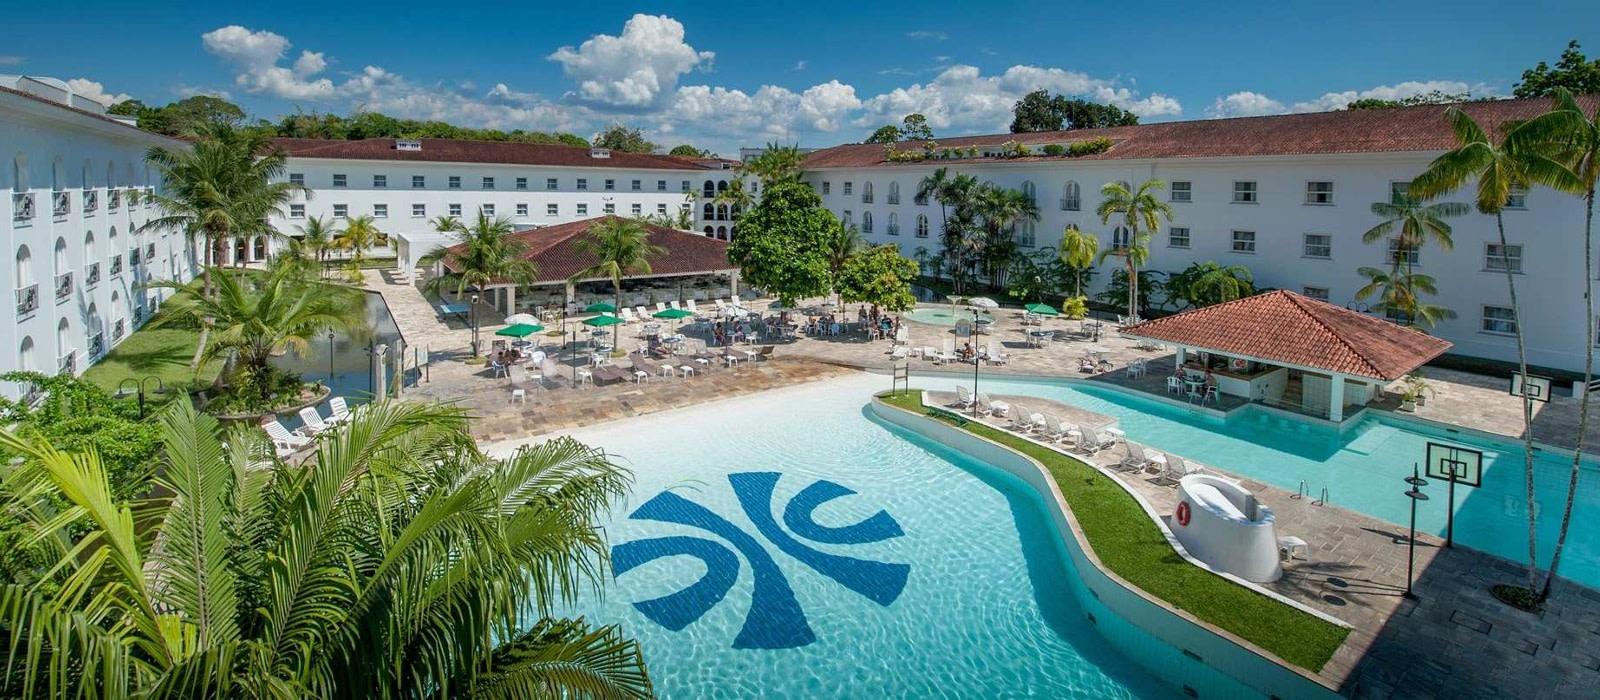 Hotel Tropical Manaus Ecoresort Brasilien